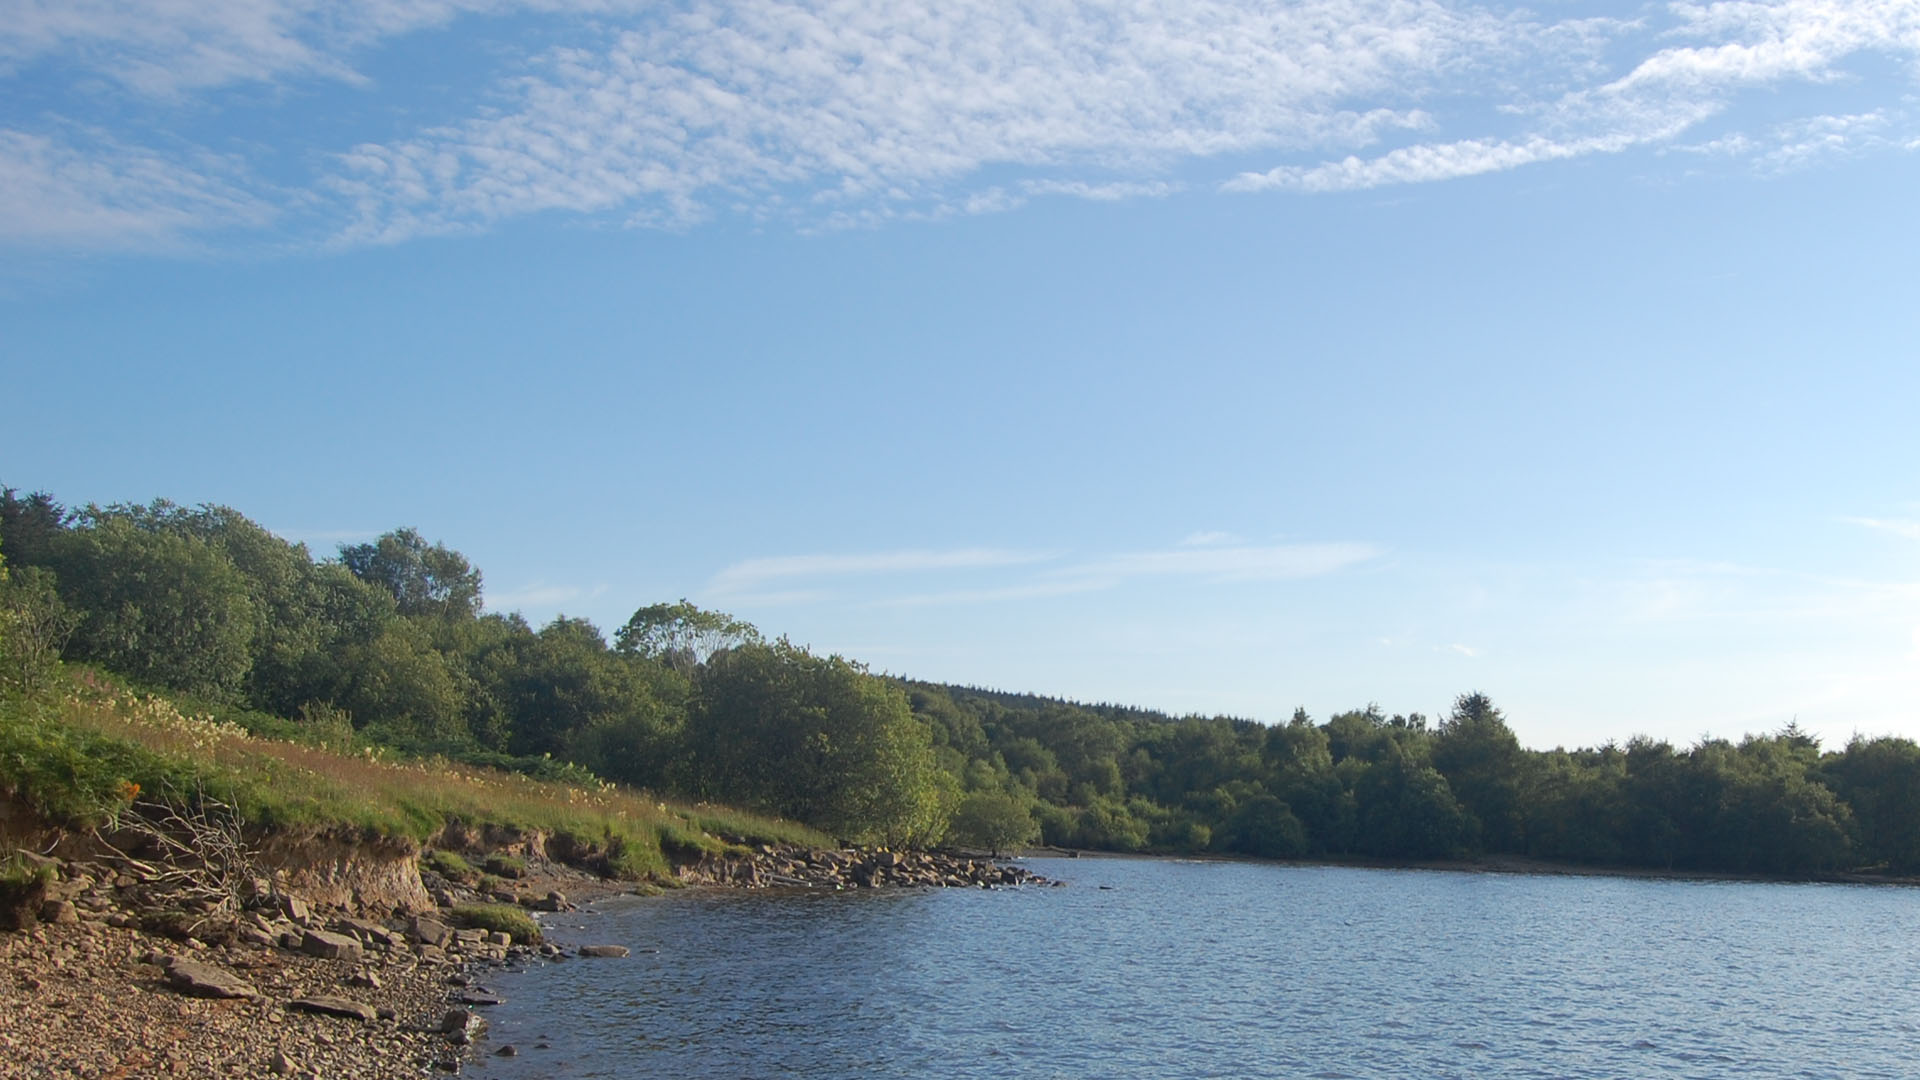 Kielder Water Park Upper North Tyne Tynedale Northumberland